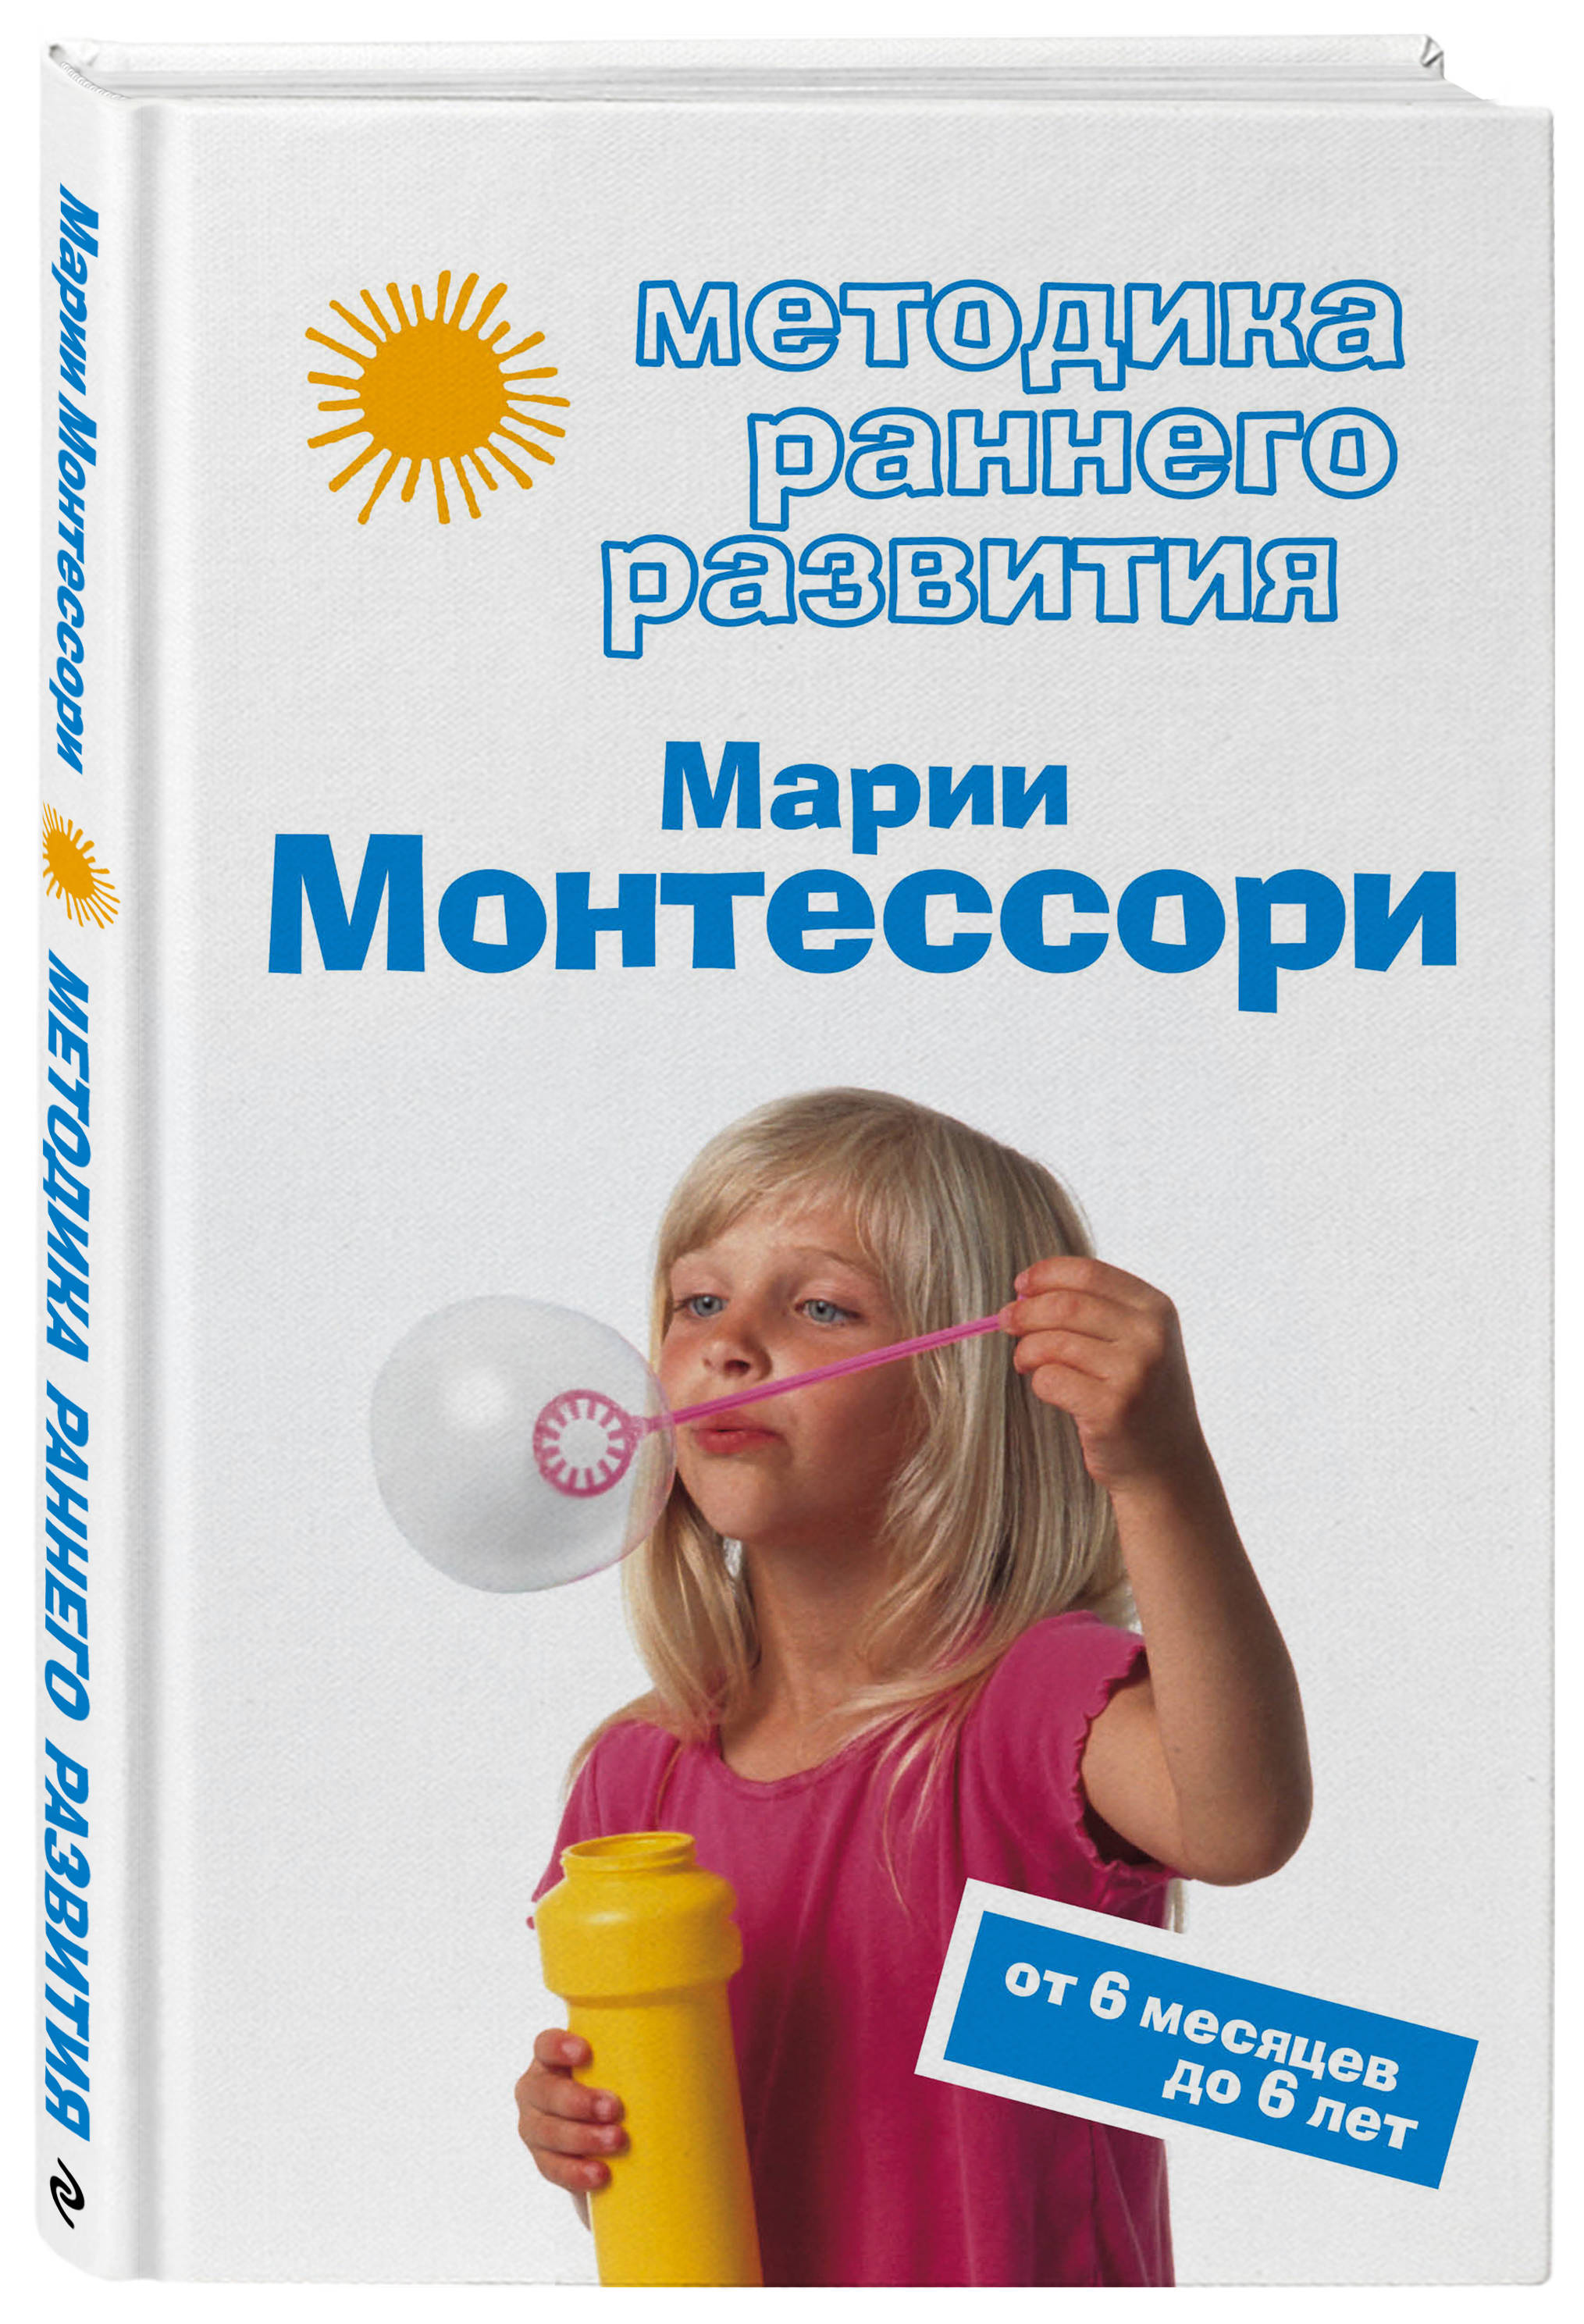 Фото #1: Методика раннего развития Марии Монтессори. От 6 месяцев до 6 лет